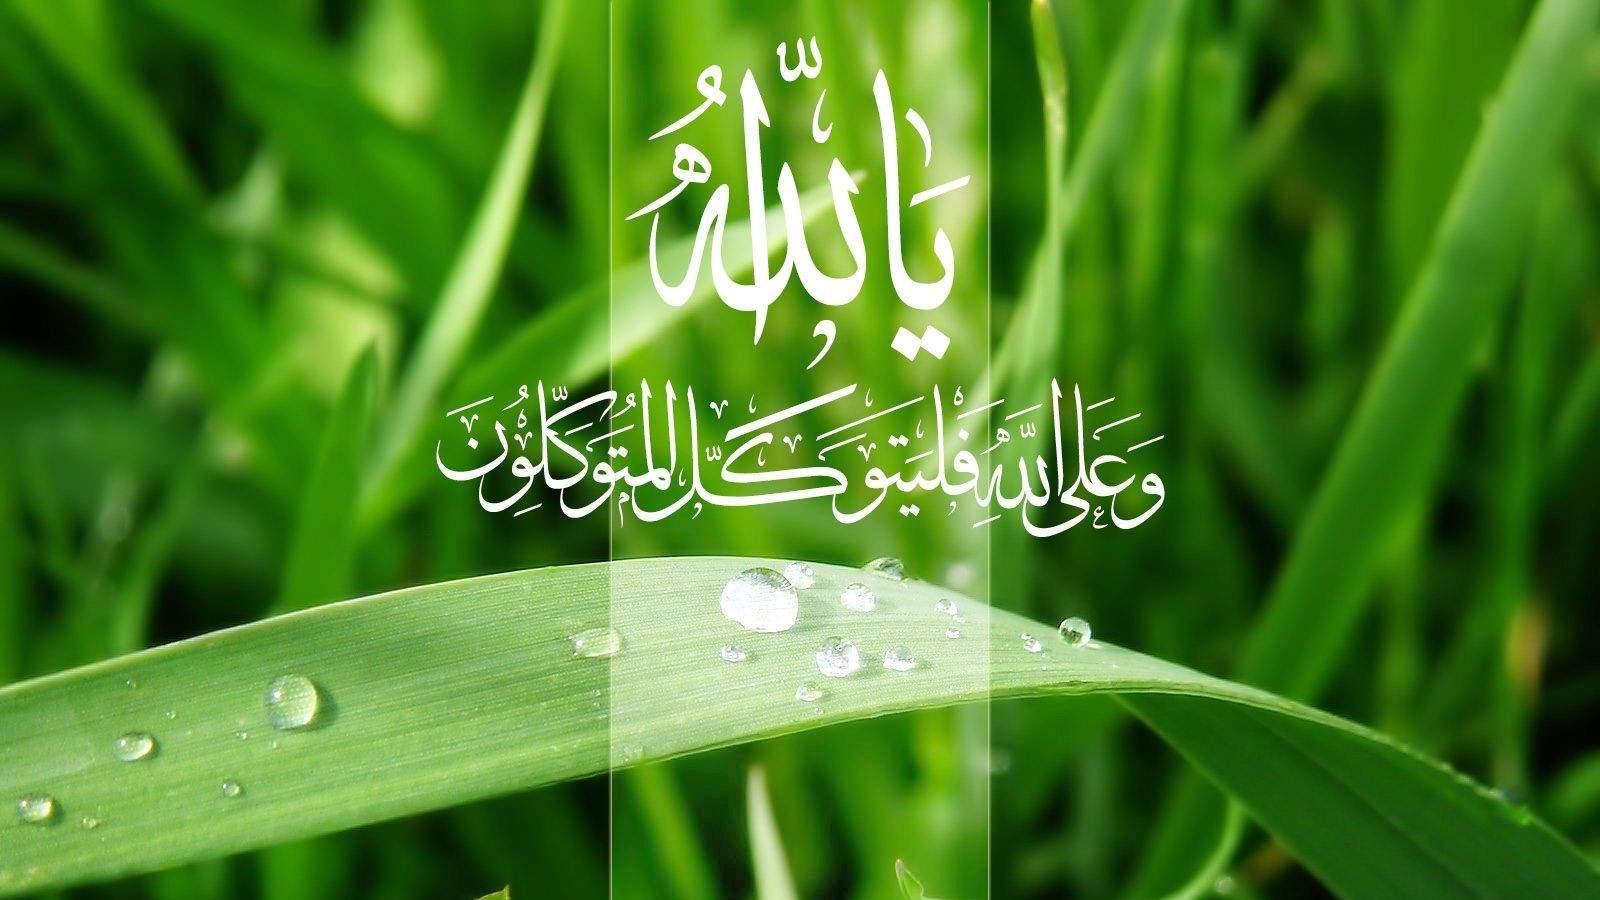 Wallpaper Islami Hd Keren Pc Kaligrafi Islamic Hd 818103